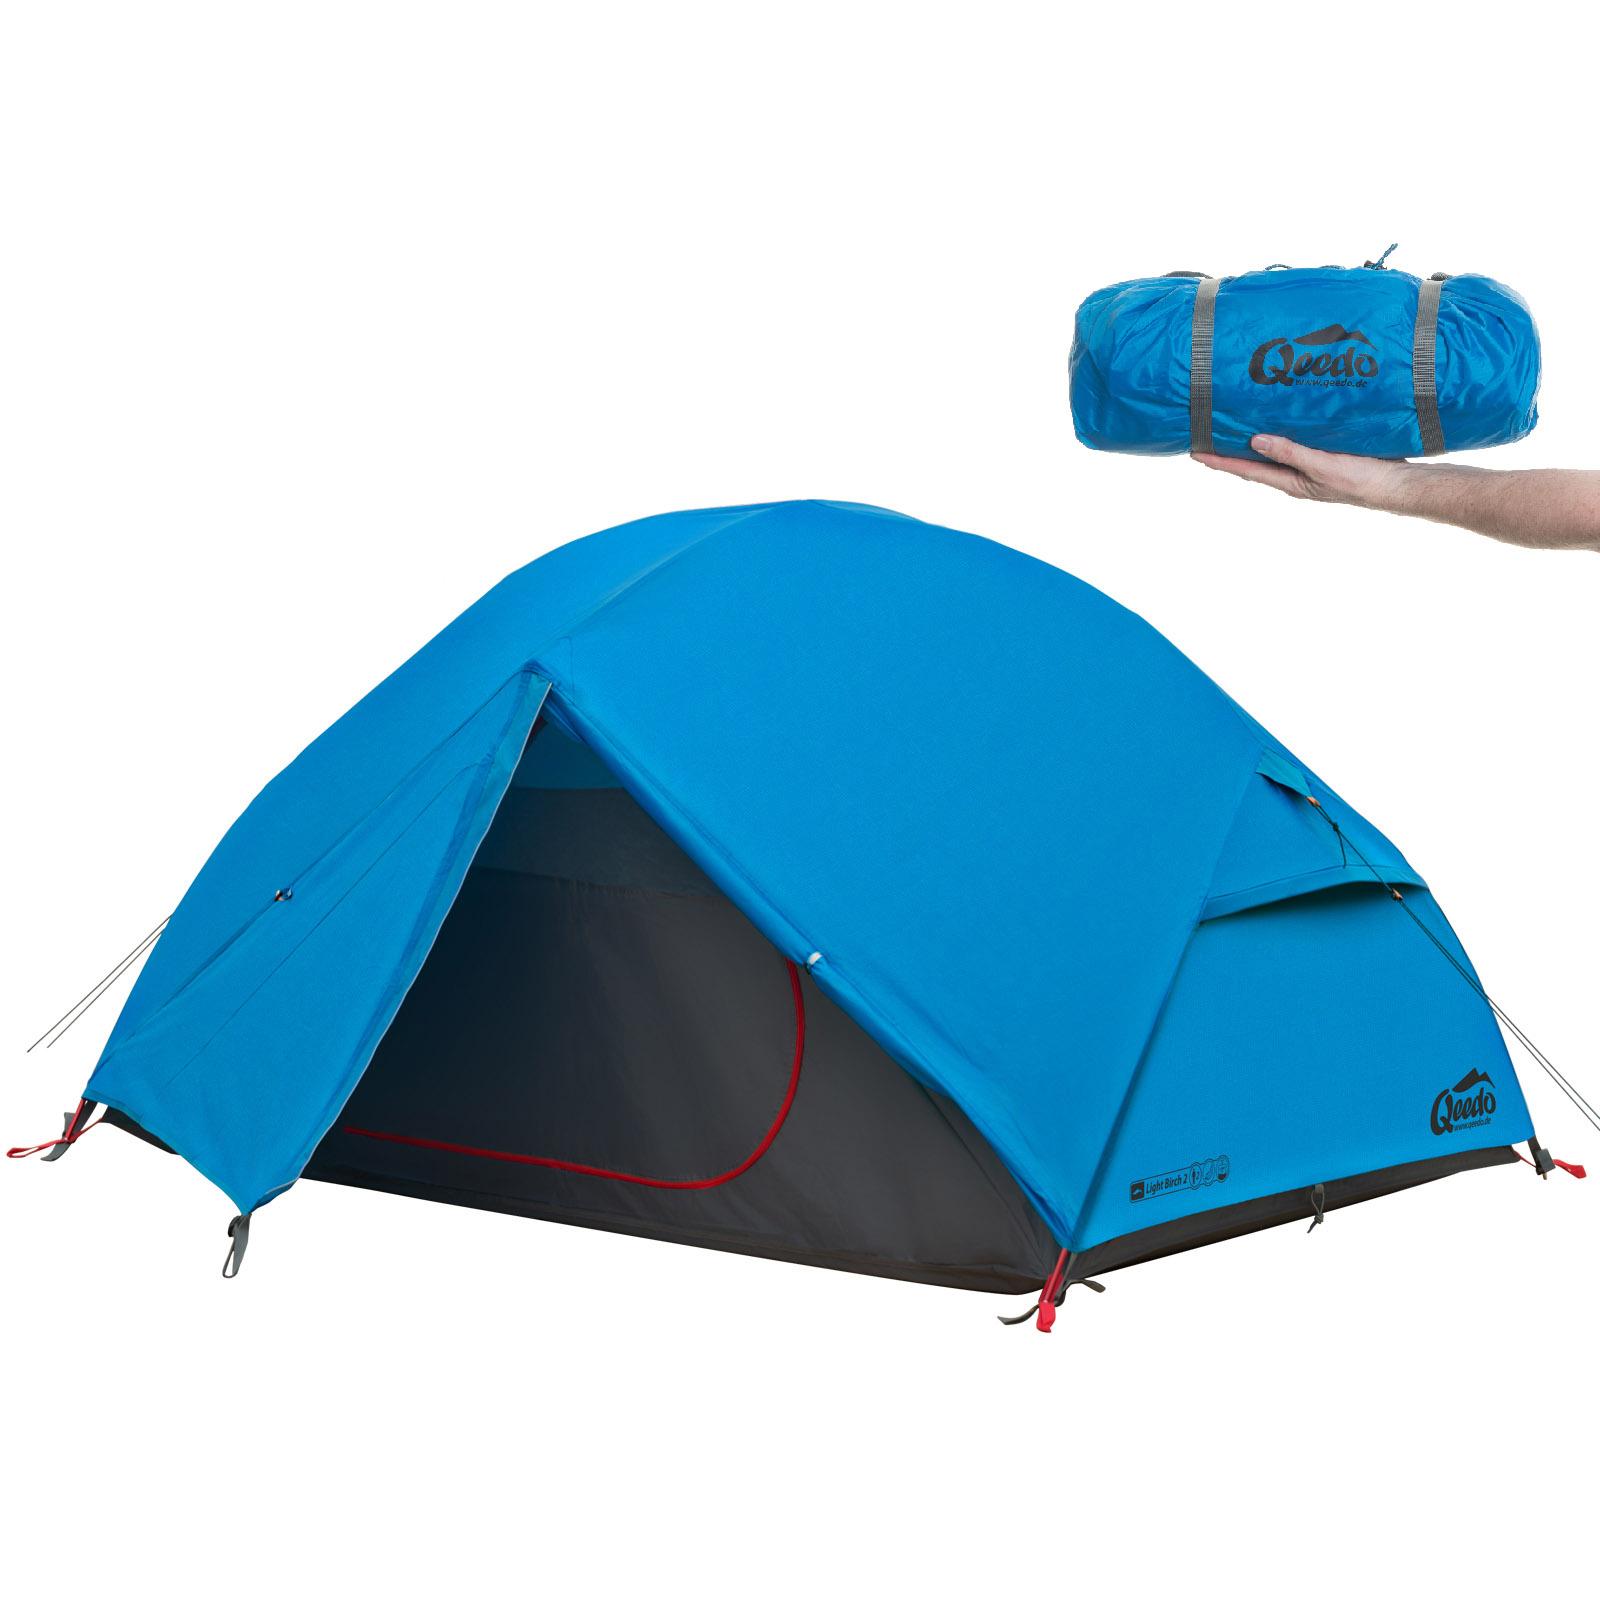 2 mann trekkingzelt qeedo light birch 2 blau personen. Black Bedroom Furniture Sets. Home Design Ideas